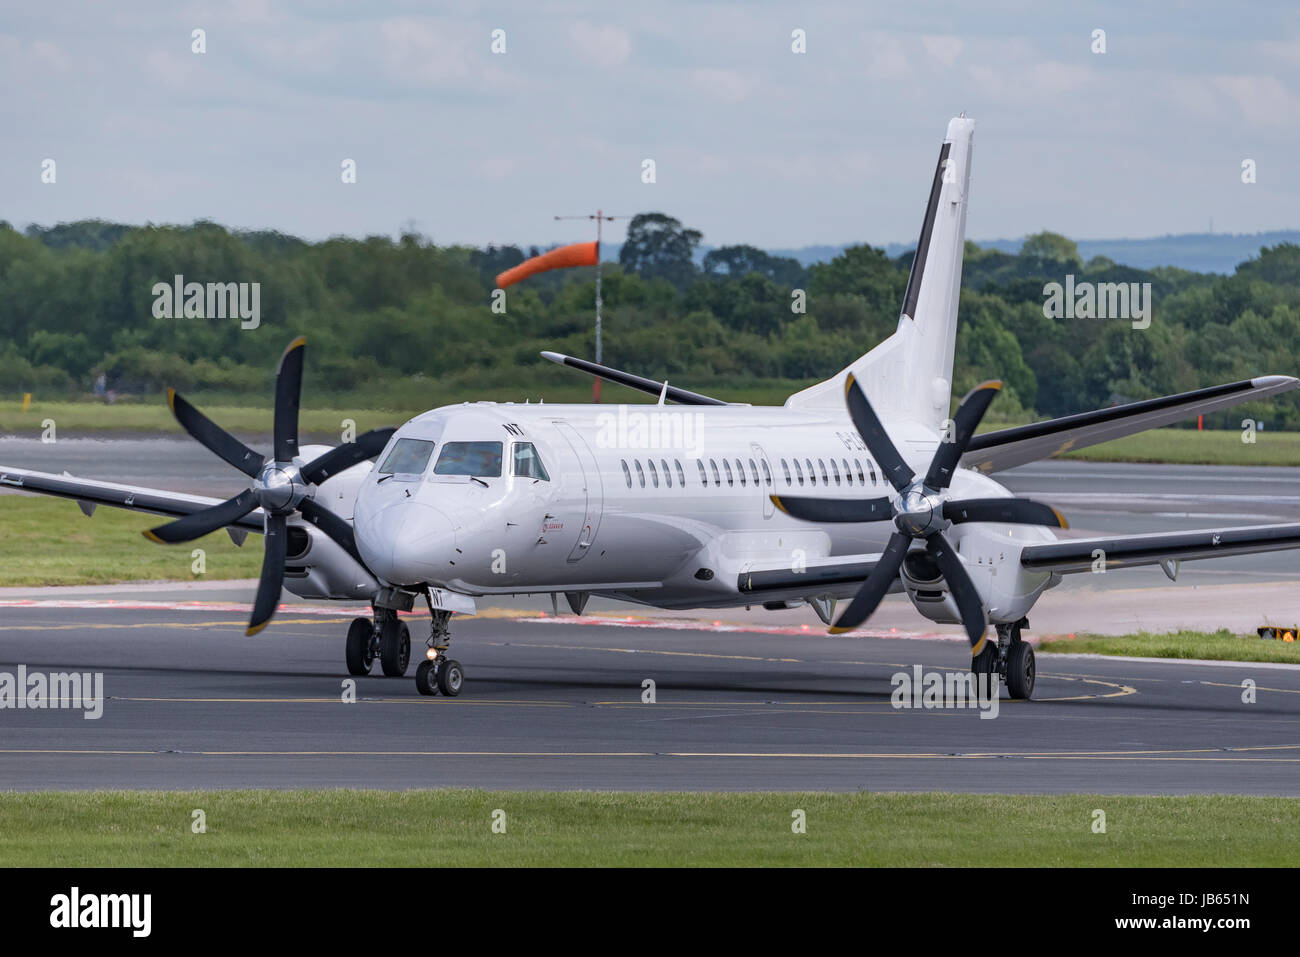 Aircraft Manchester airport Loganair turboprop - Stock Image